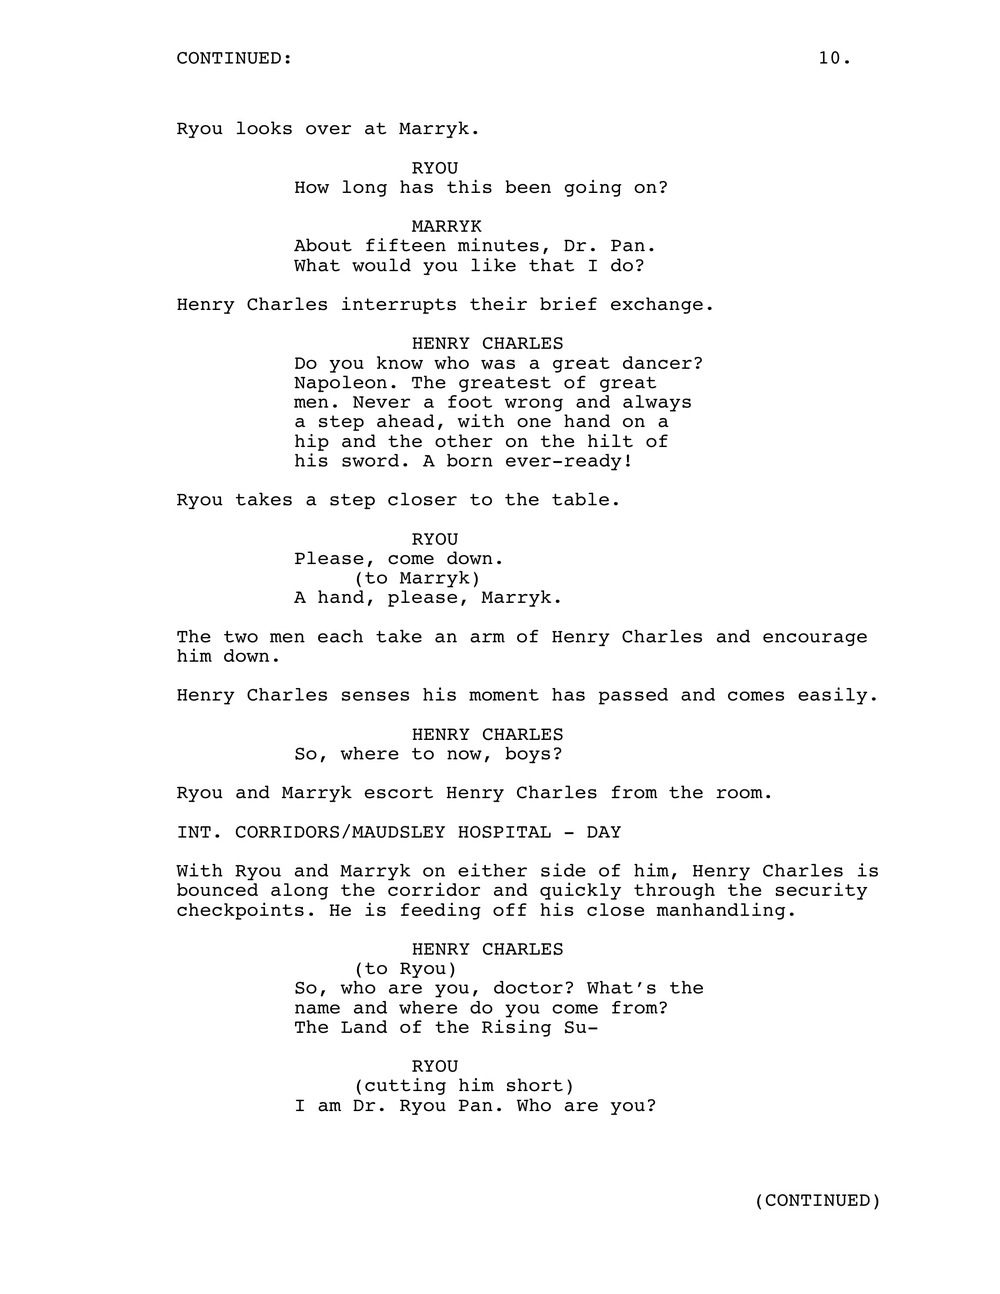 'Introducing Henry Charles' (Pilot) by Alexander Craig | 10.jpeg